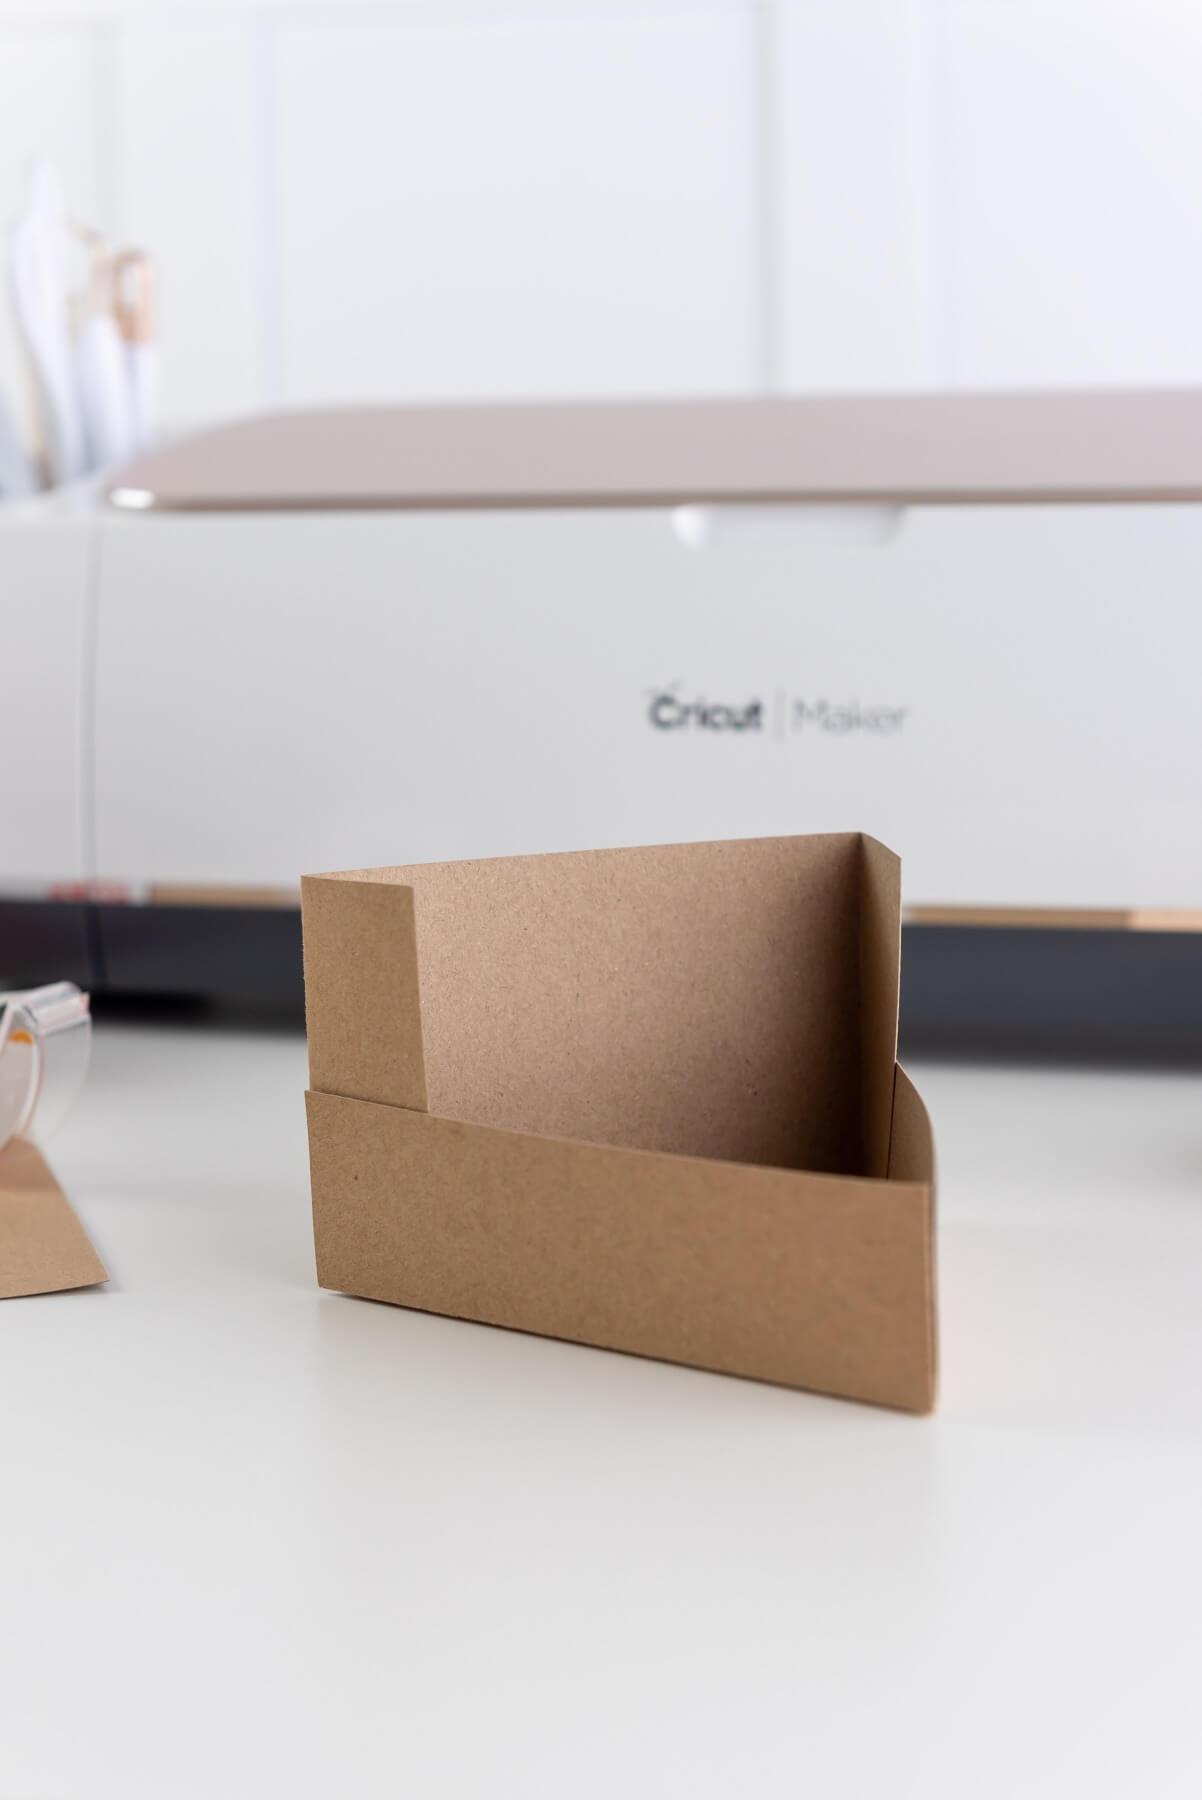 fold the foldable cricut cut pie box